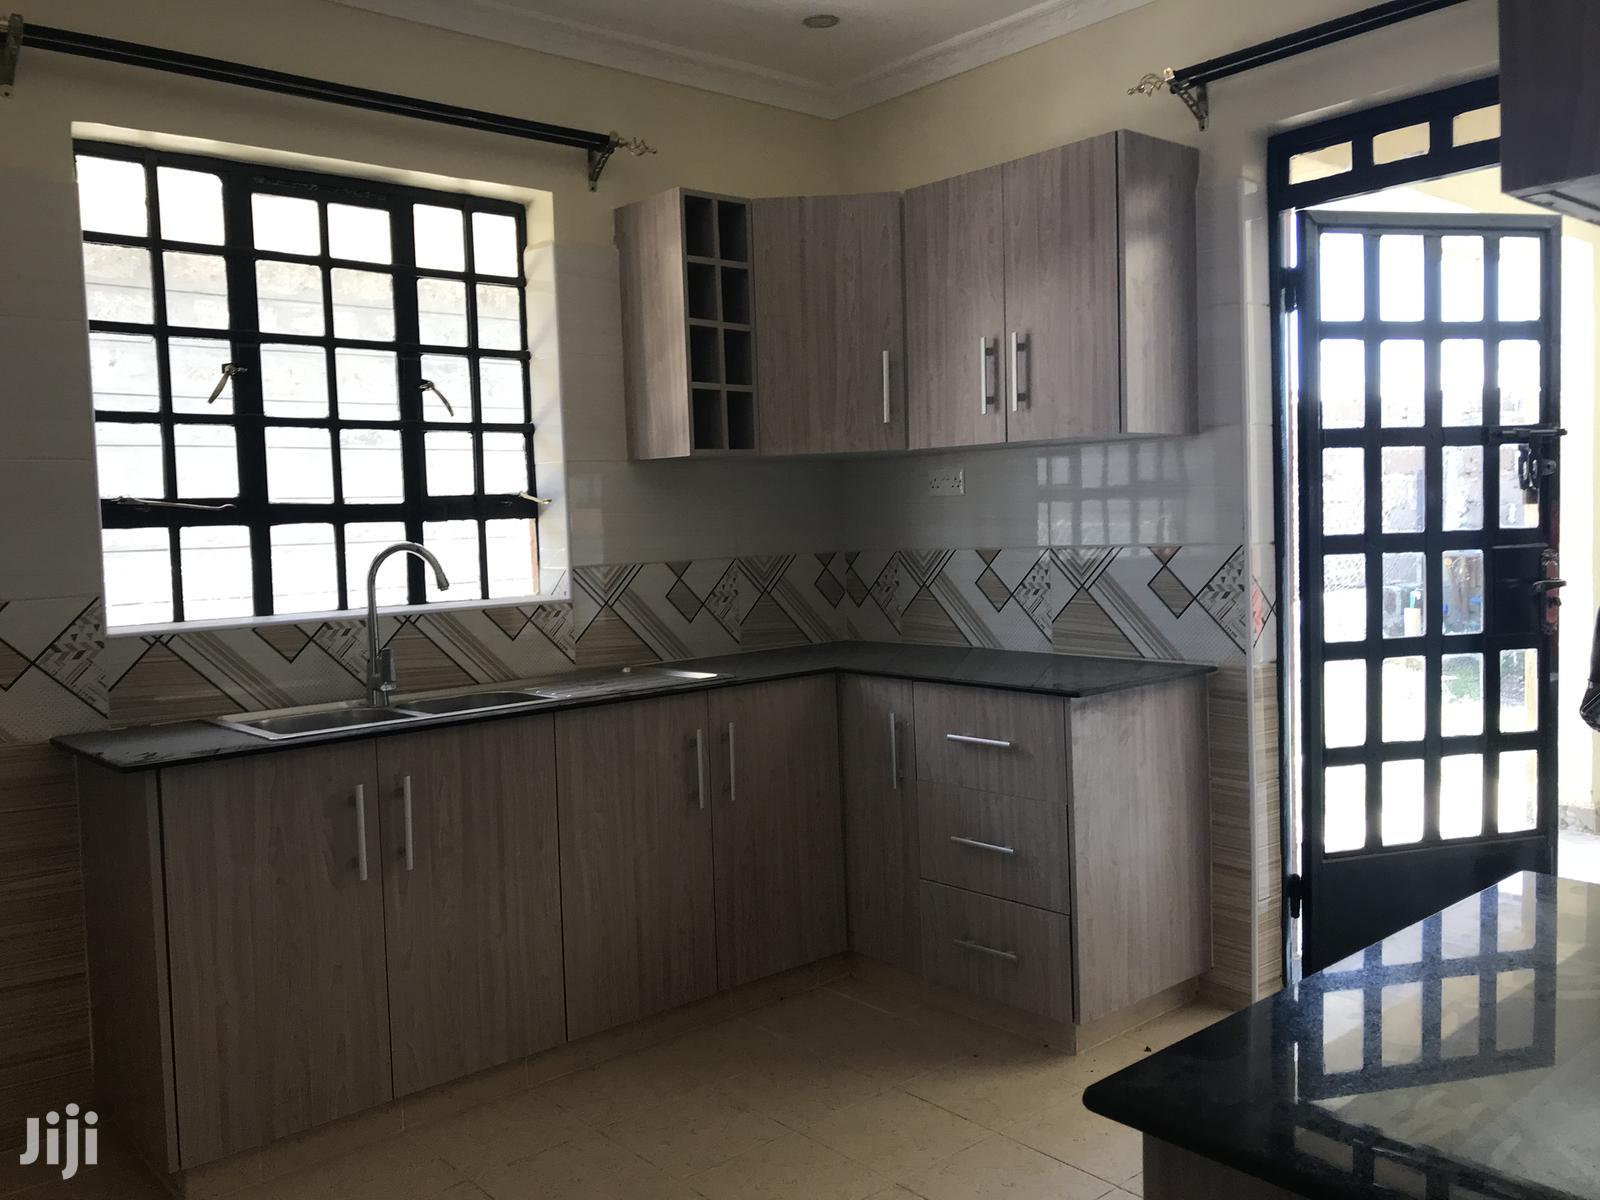 3bedroom Kitegela   Houses & Apartments For Sale for sale in Kitengela, Kajiado, Kenya